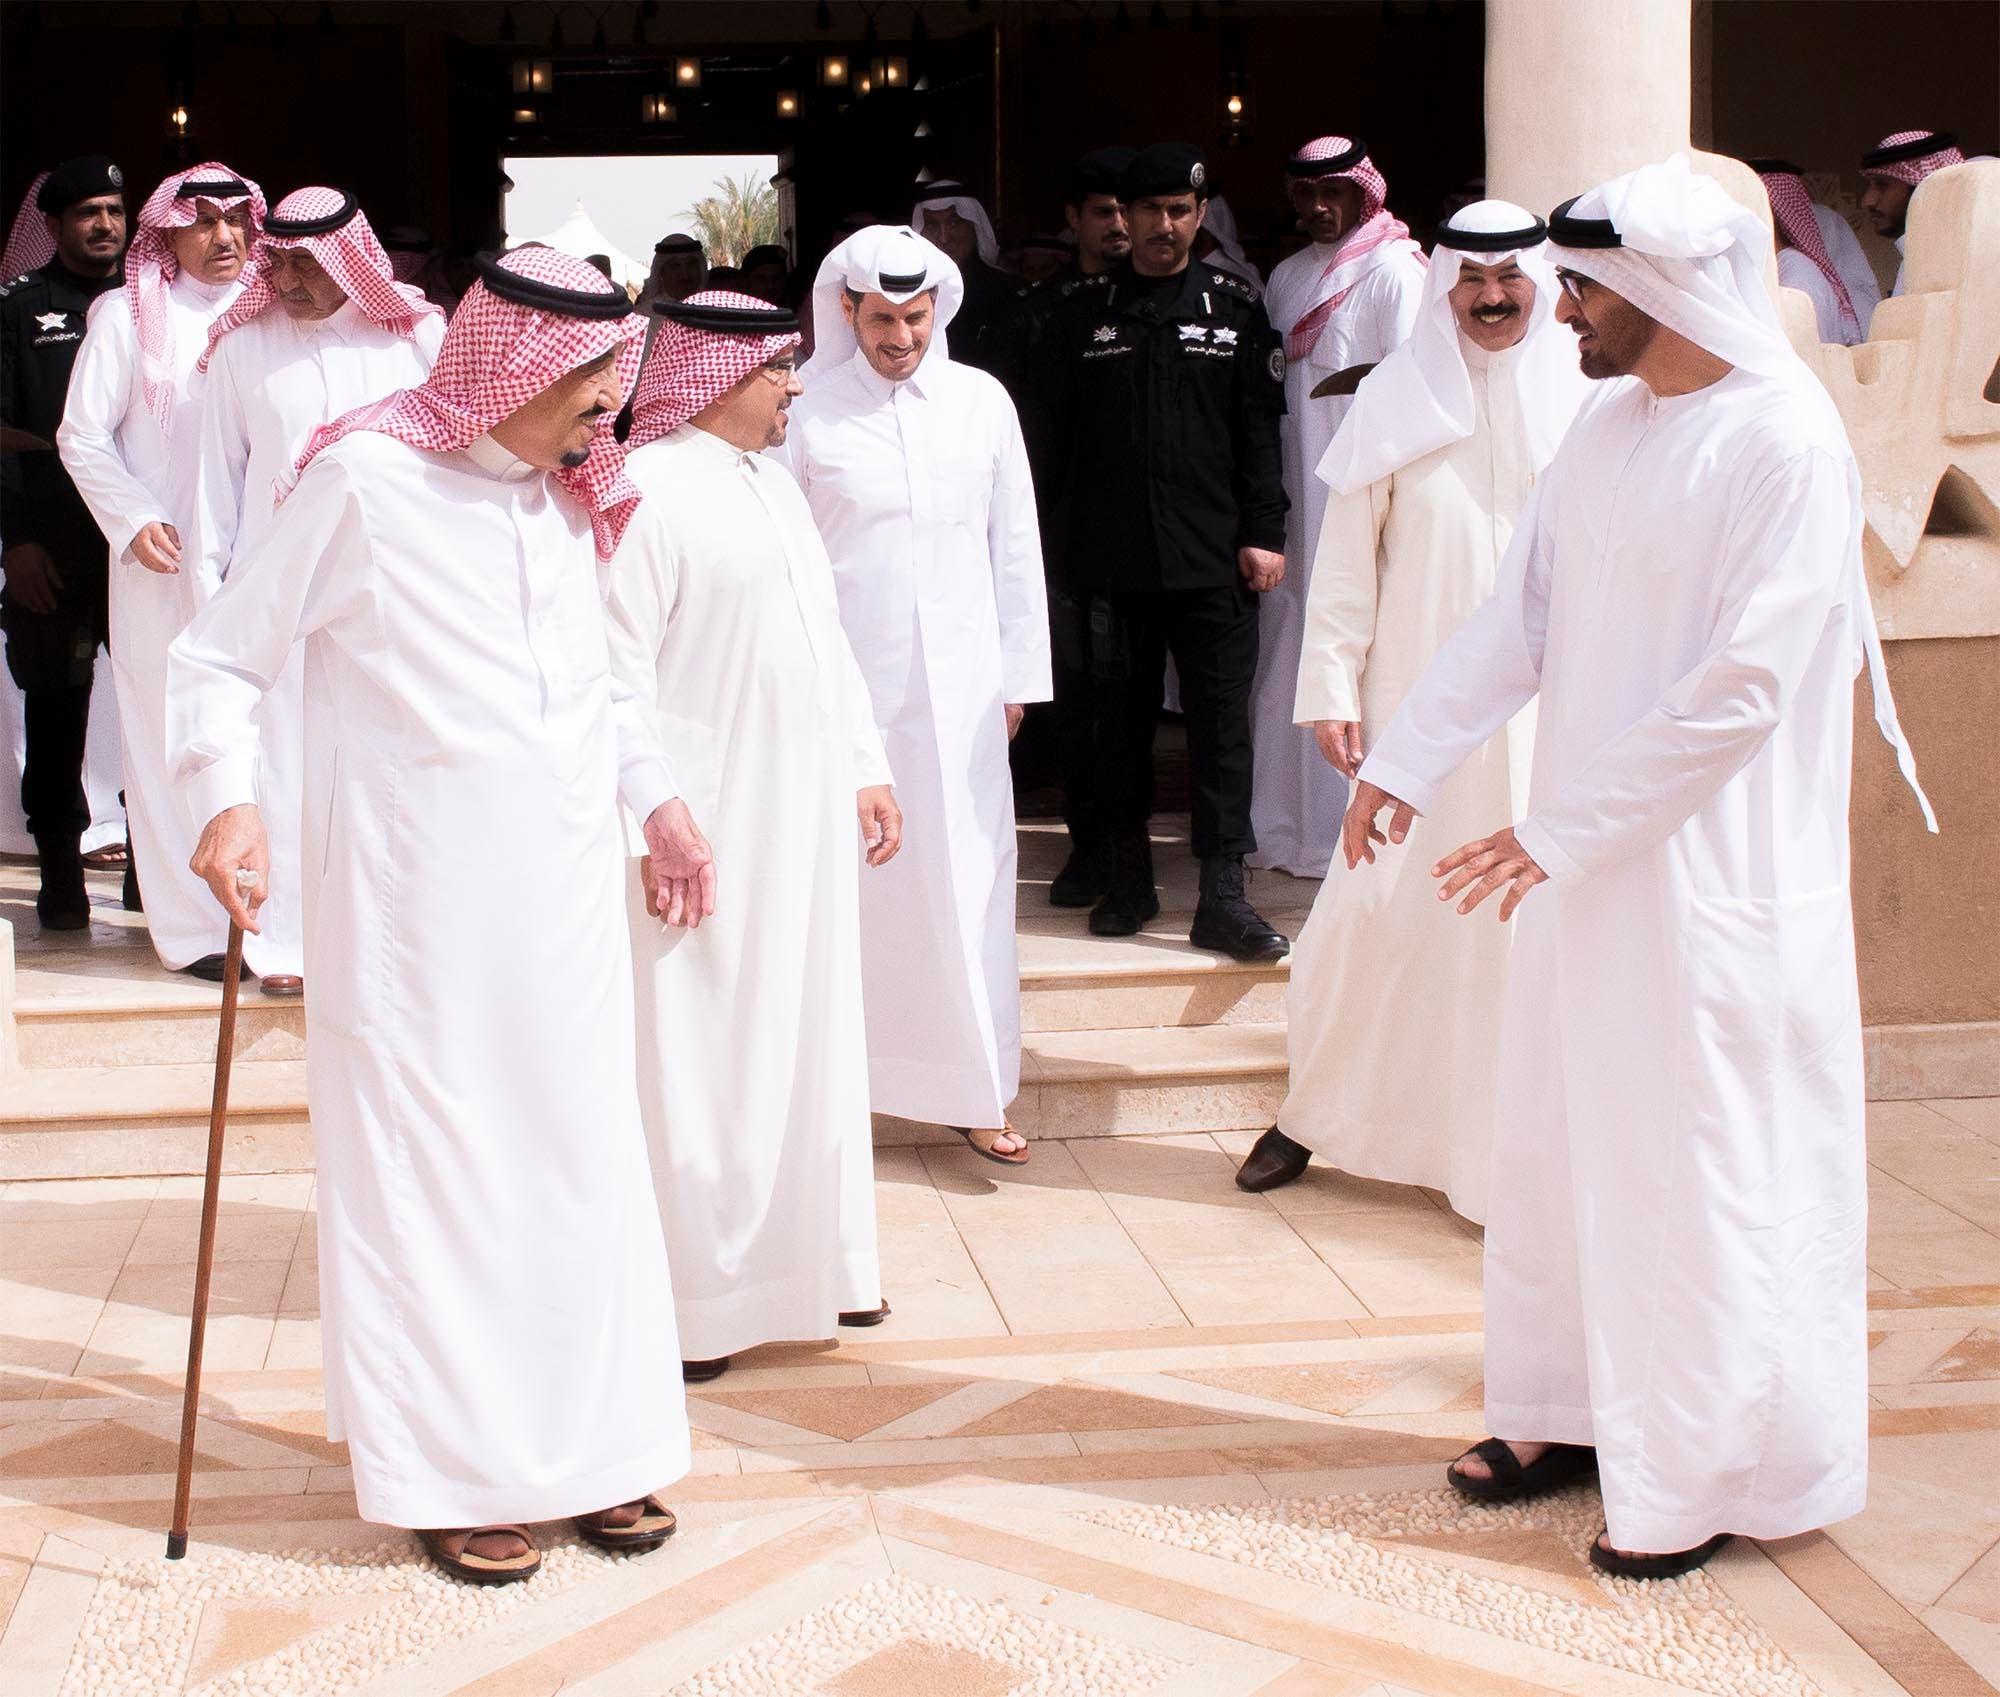 Saudi King Salman bin Abdul Aziz (L) greets Abu Dhabi Crown Prince Sheikh Mohammad bin Zayed Al Nahyan (R), Bahrain's Crown Prince Salman bin Hamad Al-Khalifa (2nd L), Qatari Prime Minister and Interior Minister Sheikh Abdullah bin Nasser Al Thani (3rd L) and Kuwait's Deputy Premier and Interior Minister Sheikh Mohammad Al-Khaled Al-Hamad Al-Sabah. (Al Arabiya)